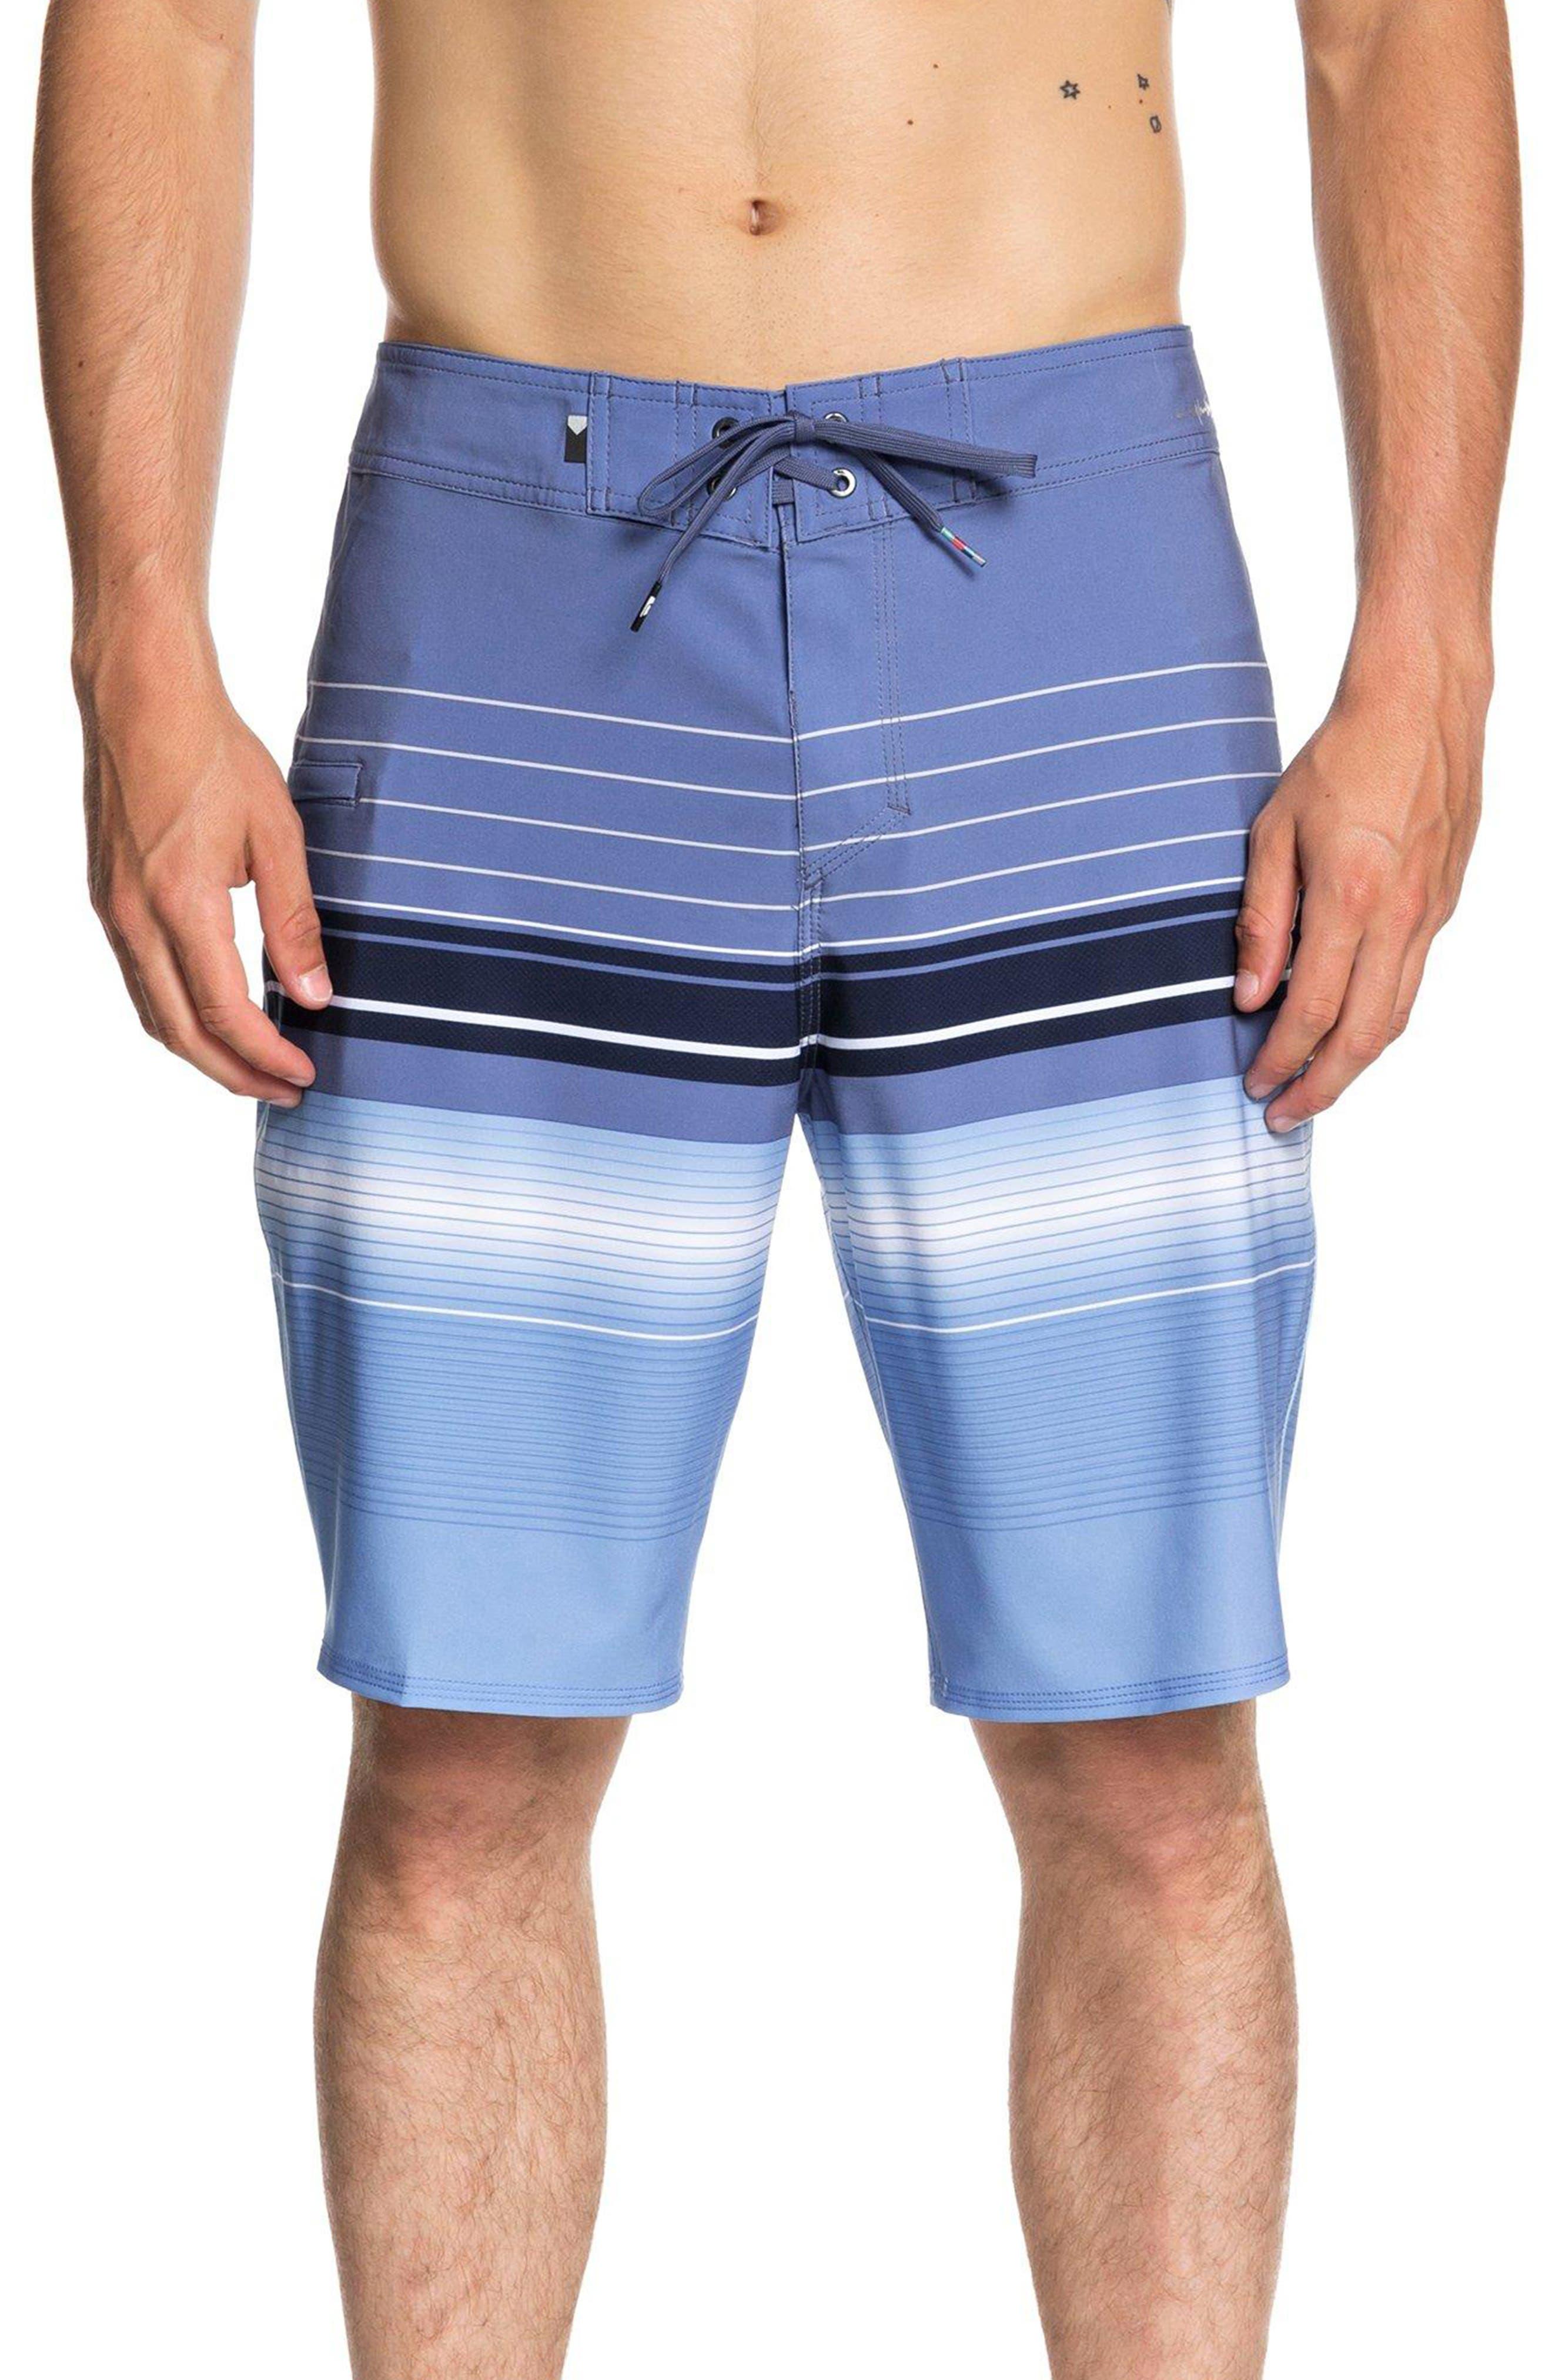 Highline Swell Vision Board Shorts,                         Main,                         color, BIJOU BLUE